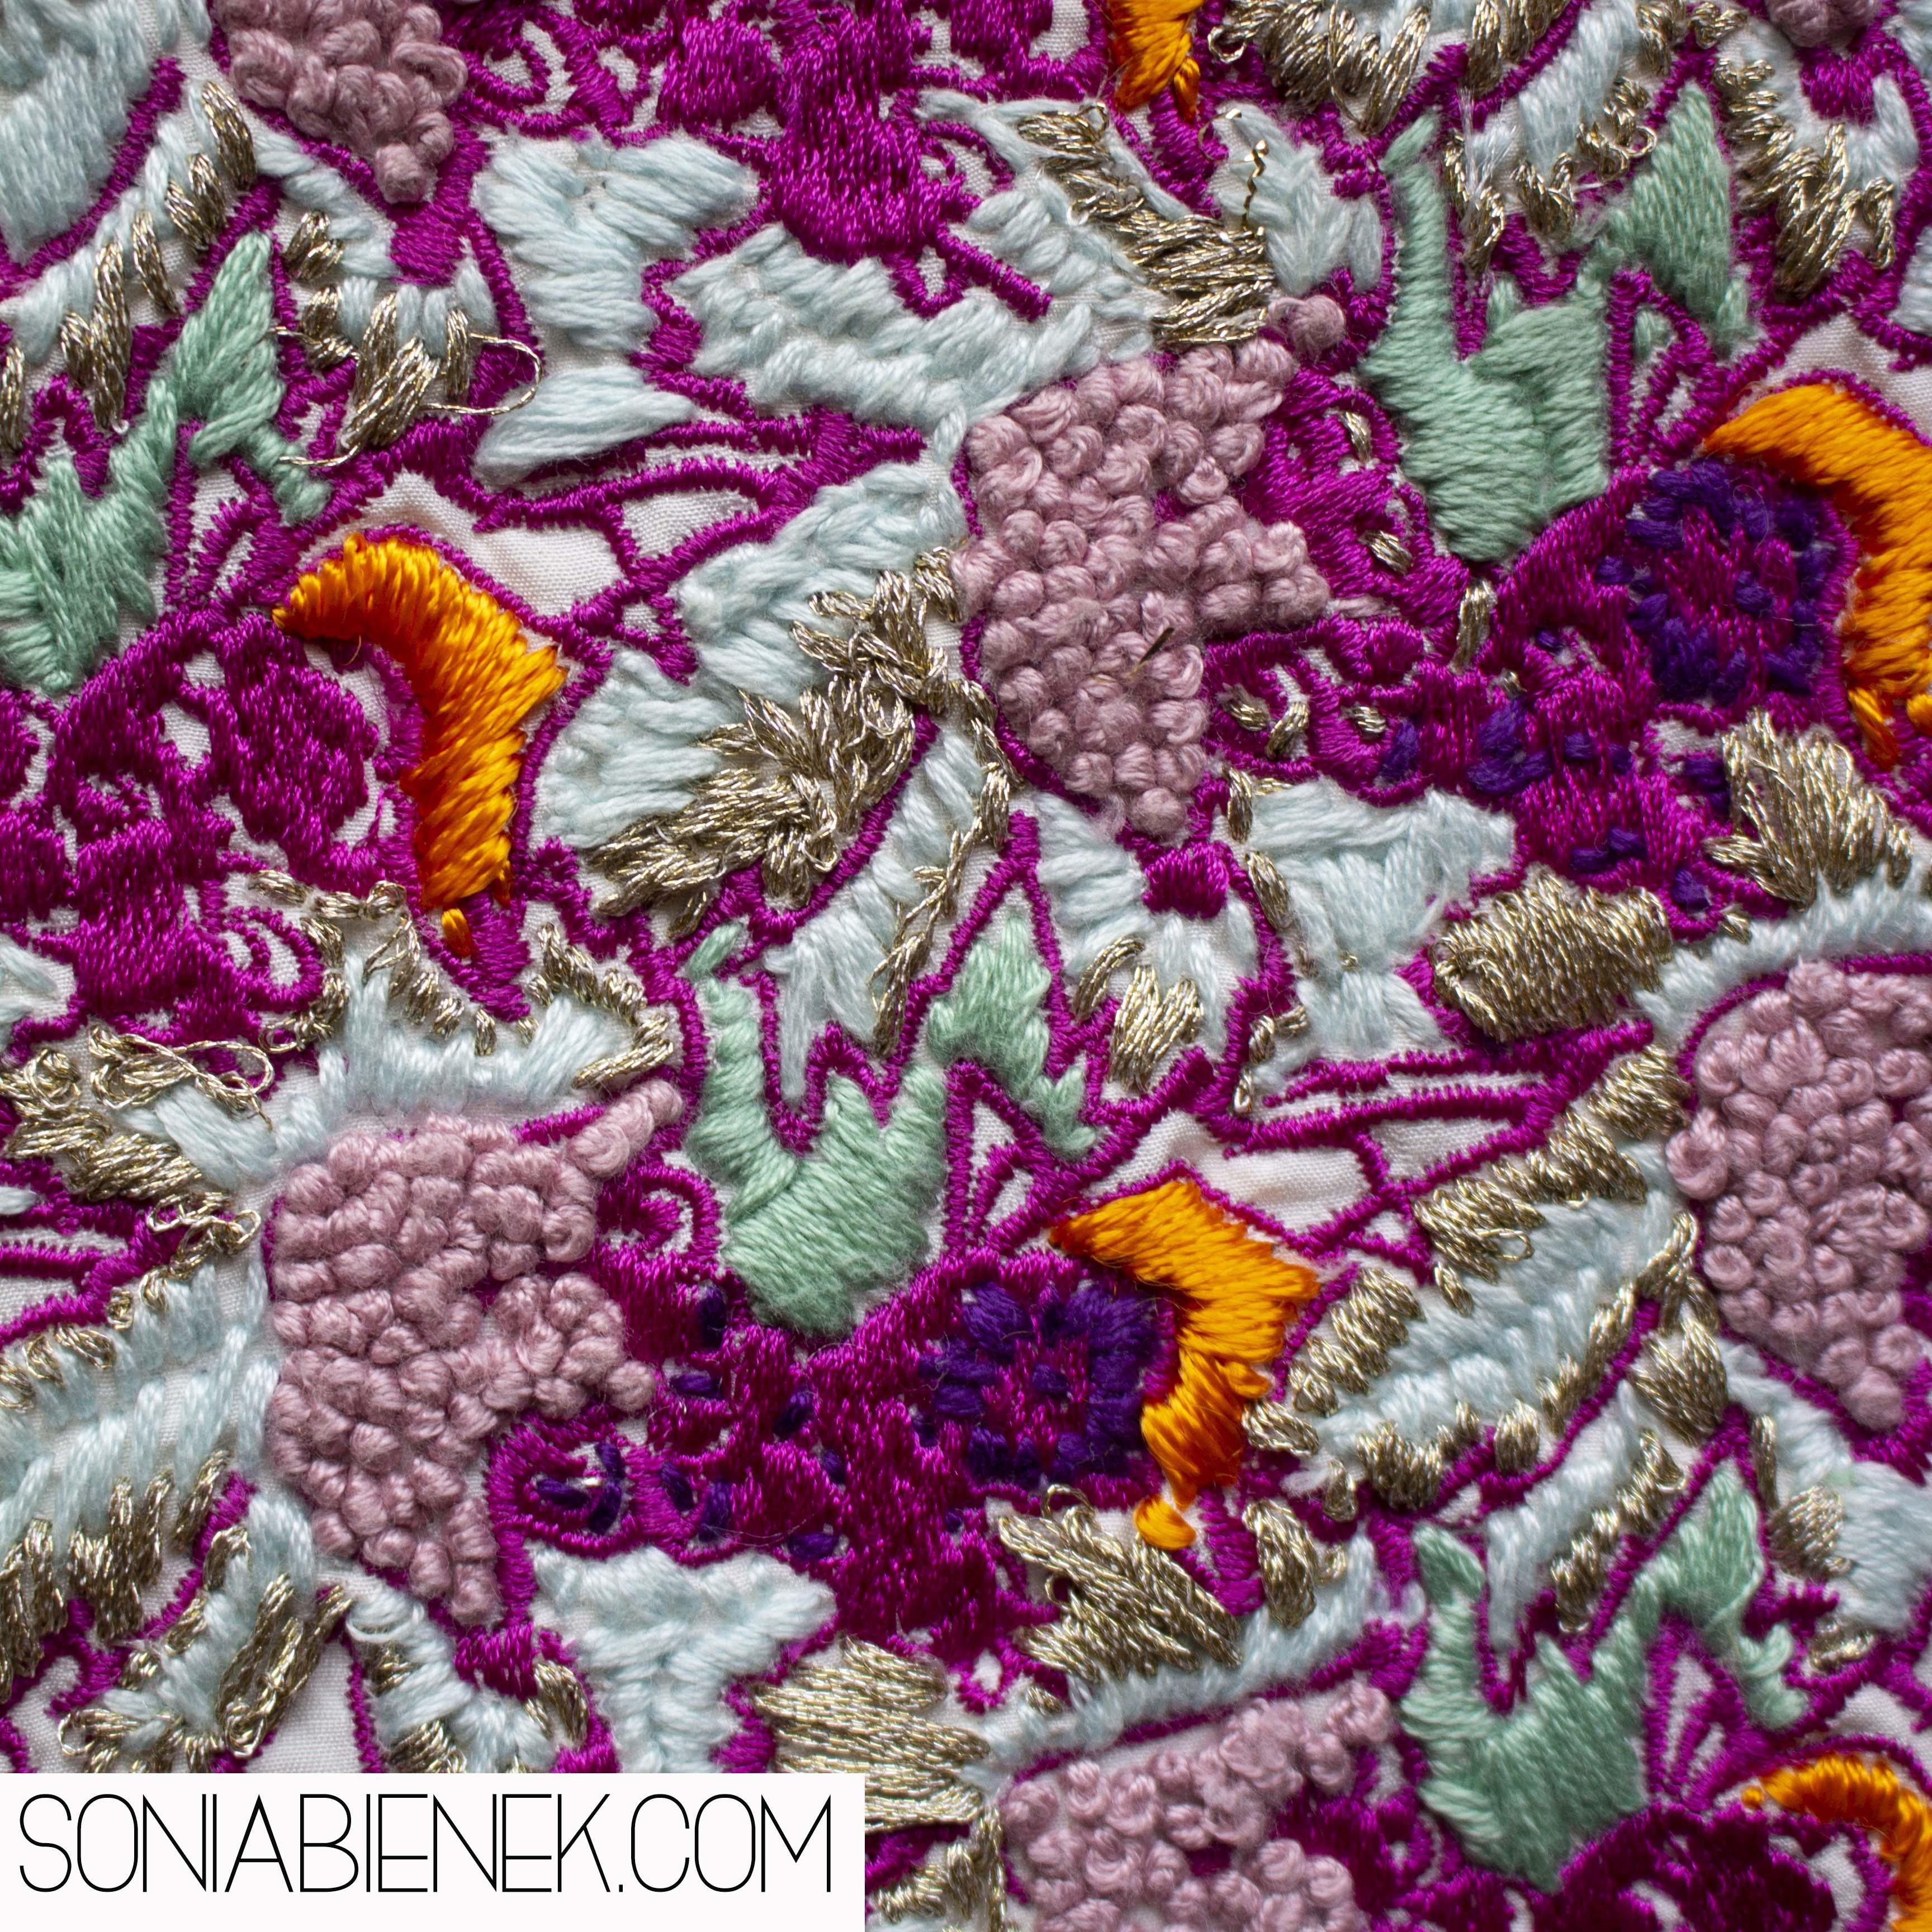 embroidery-embellishment-sonia-b